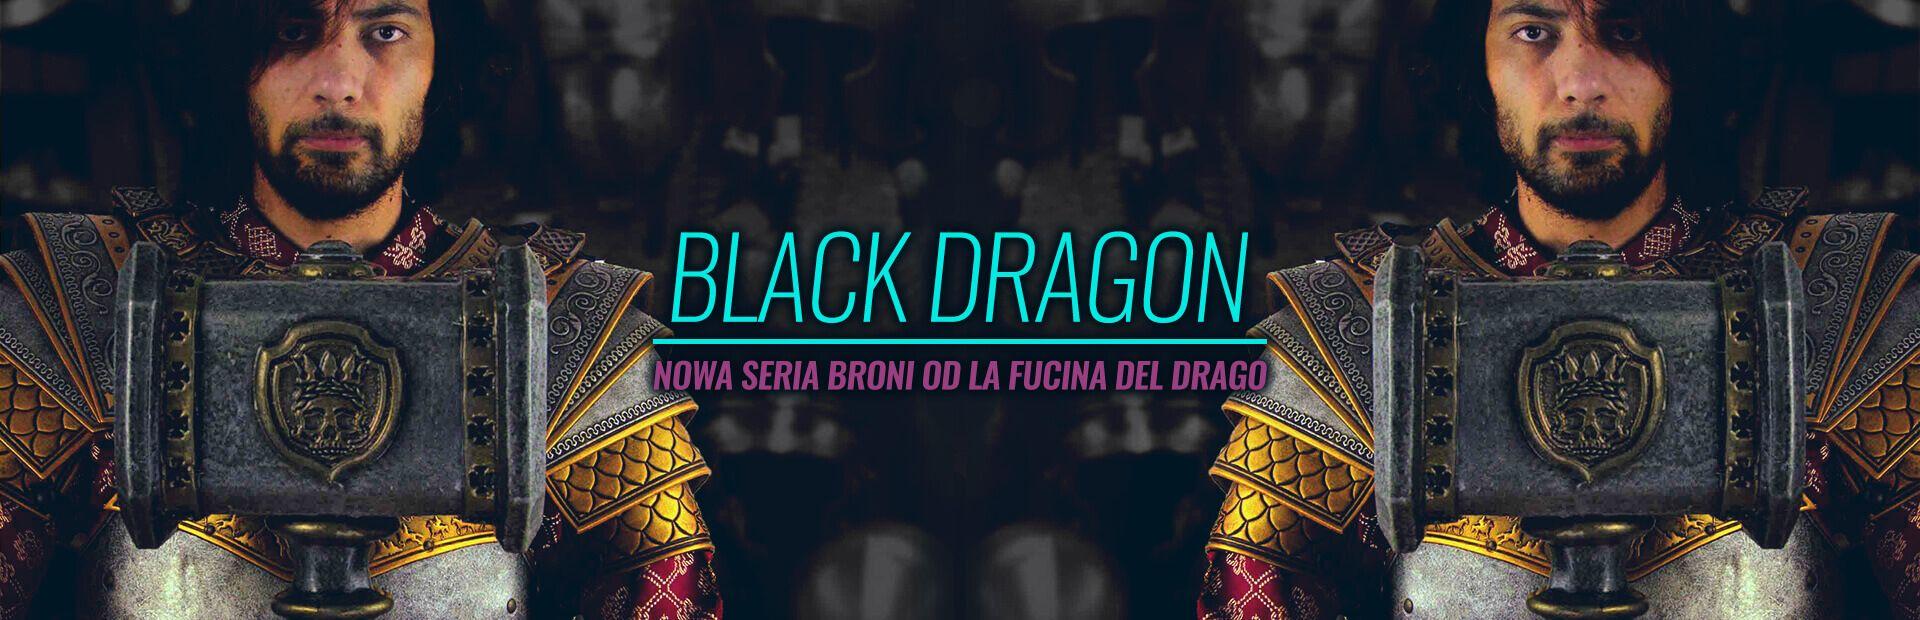 https://www.5zywiolow.com/shop/pl/manufacturer/fucina-del-drago